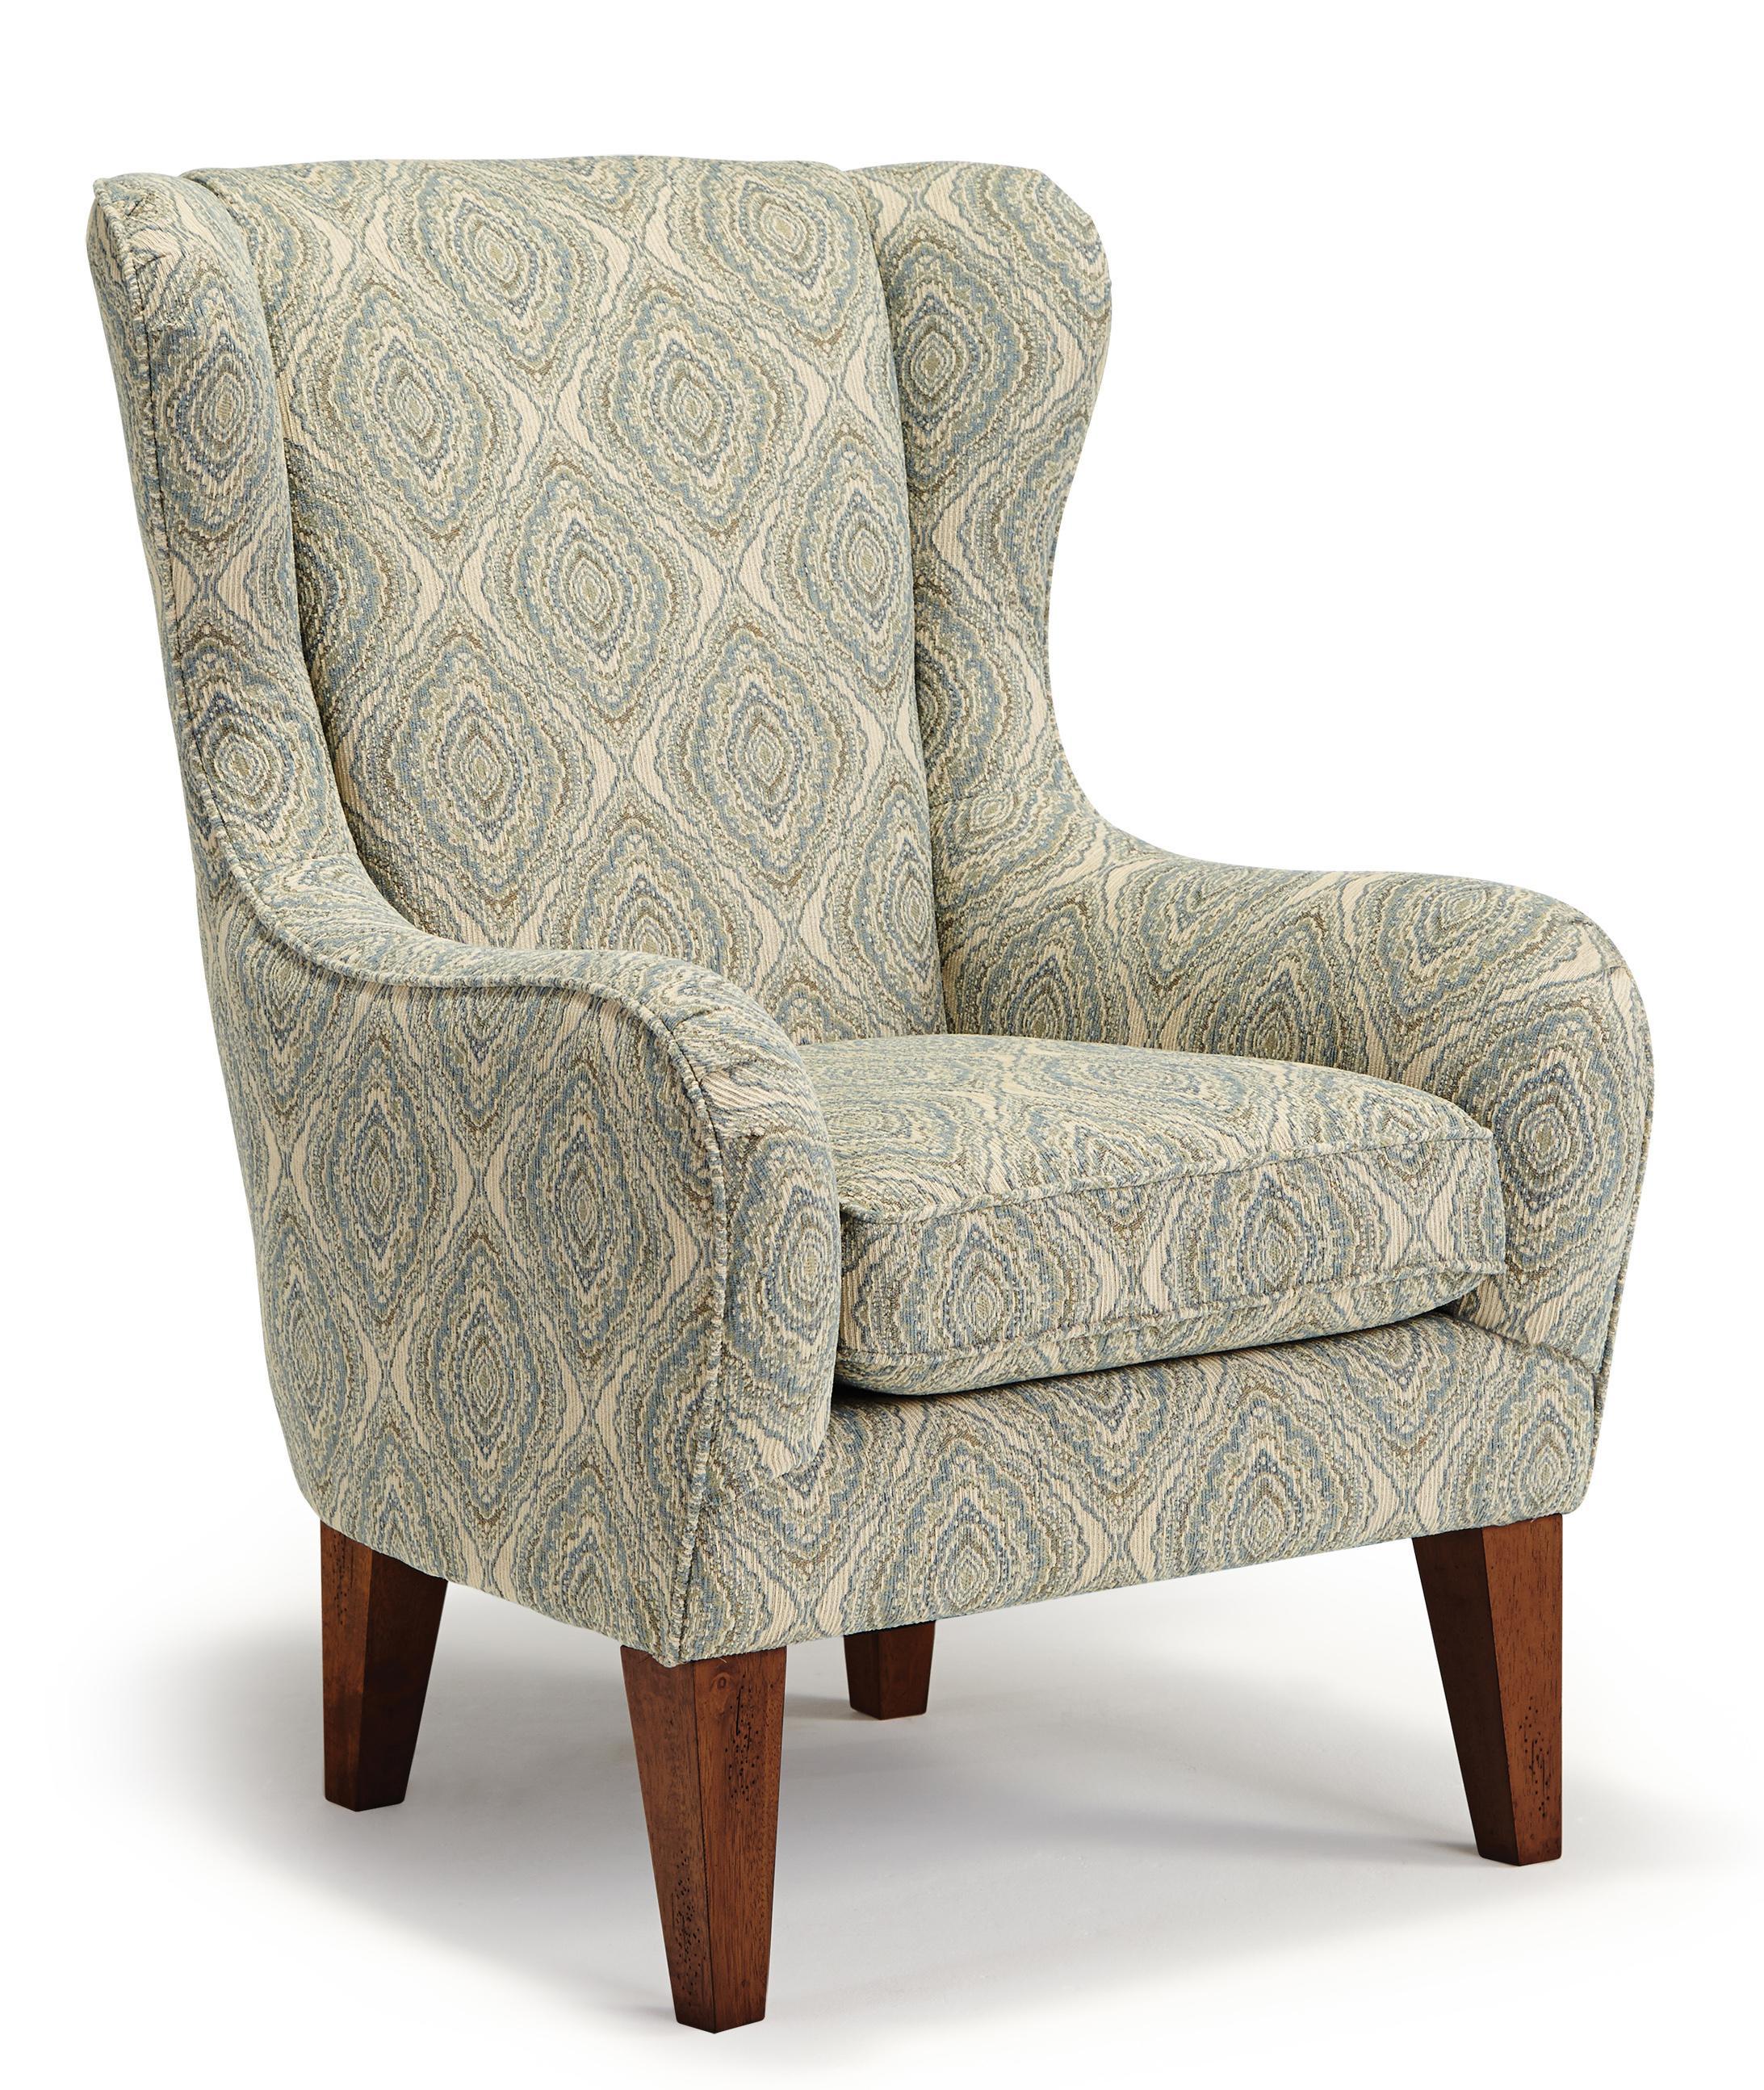 Club Chairs Lorette Club Chair by Best Home Furnishings at Best Home Furnishings